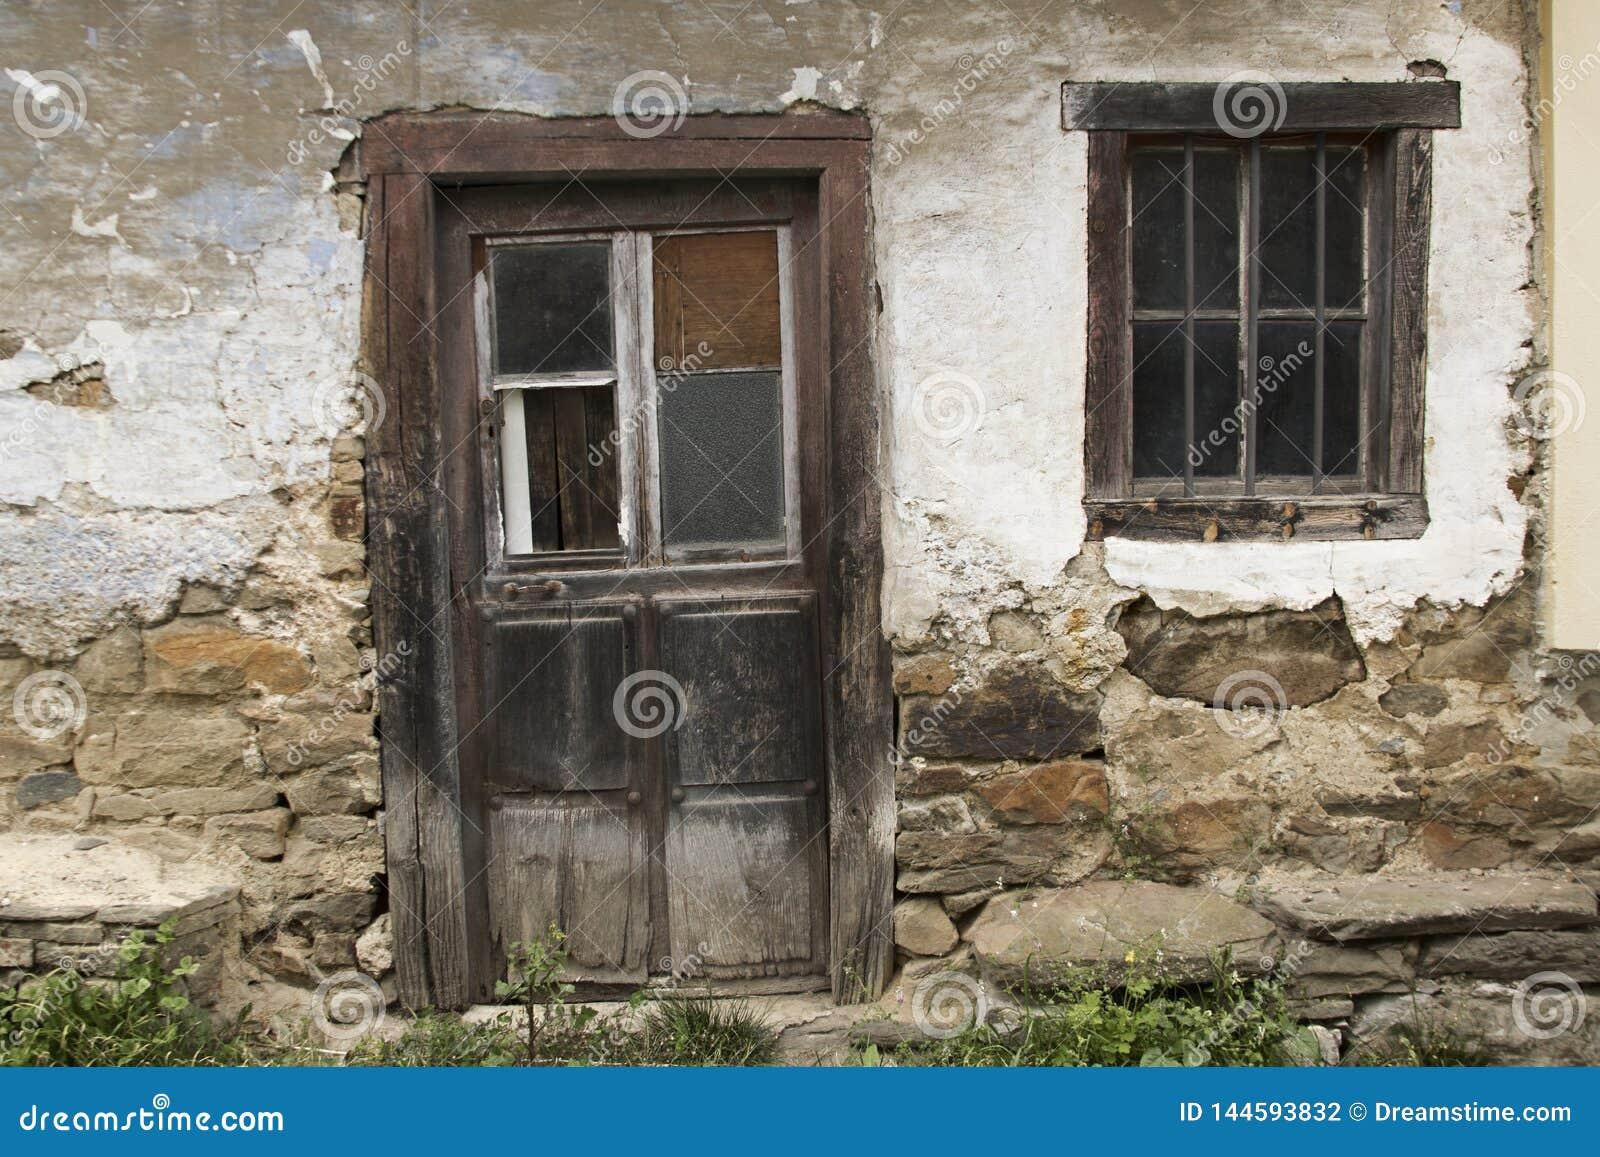 Fachada da casa abandonada